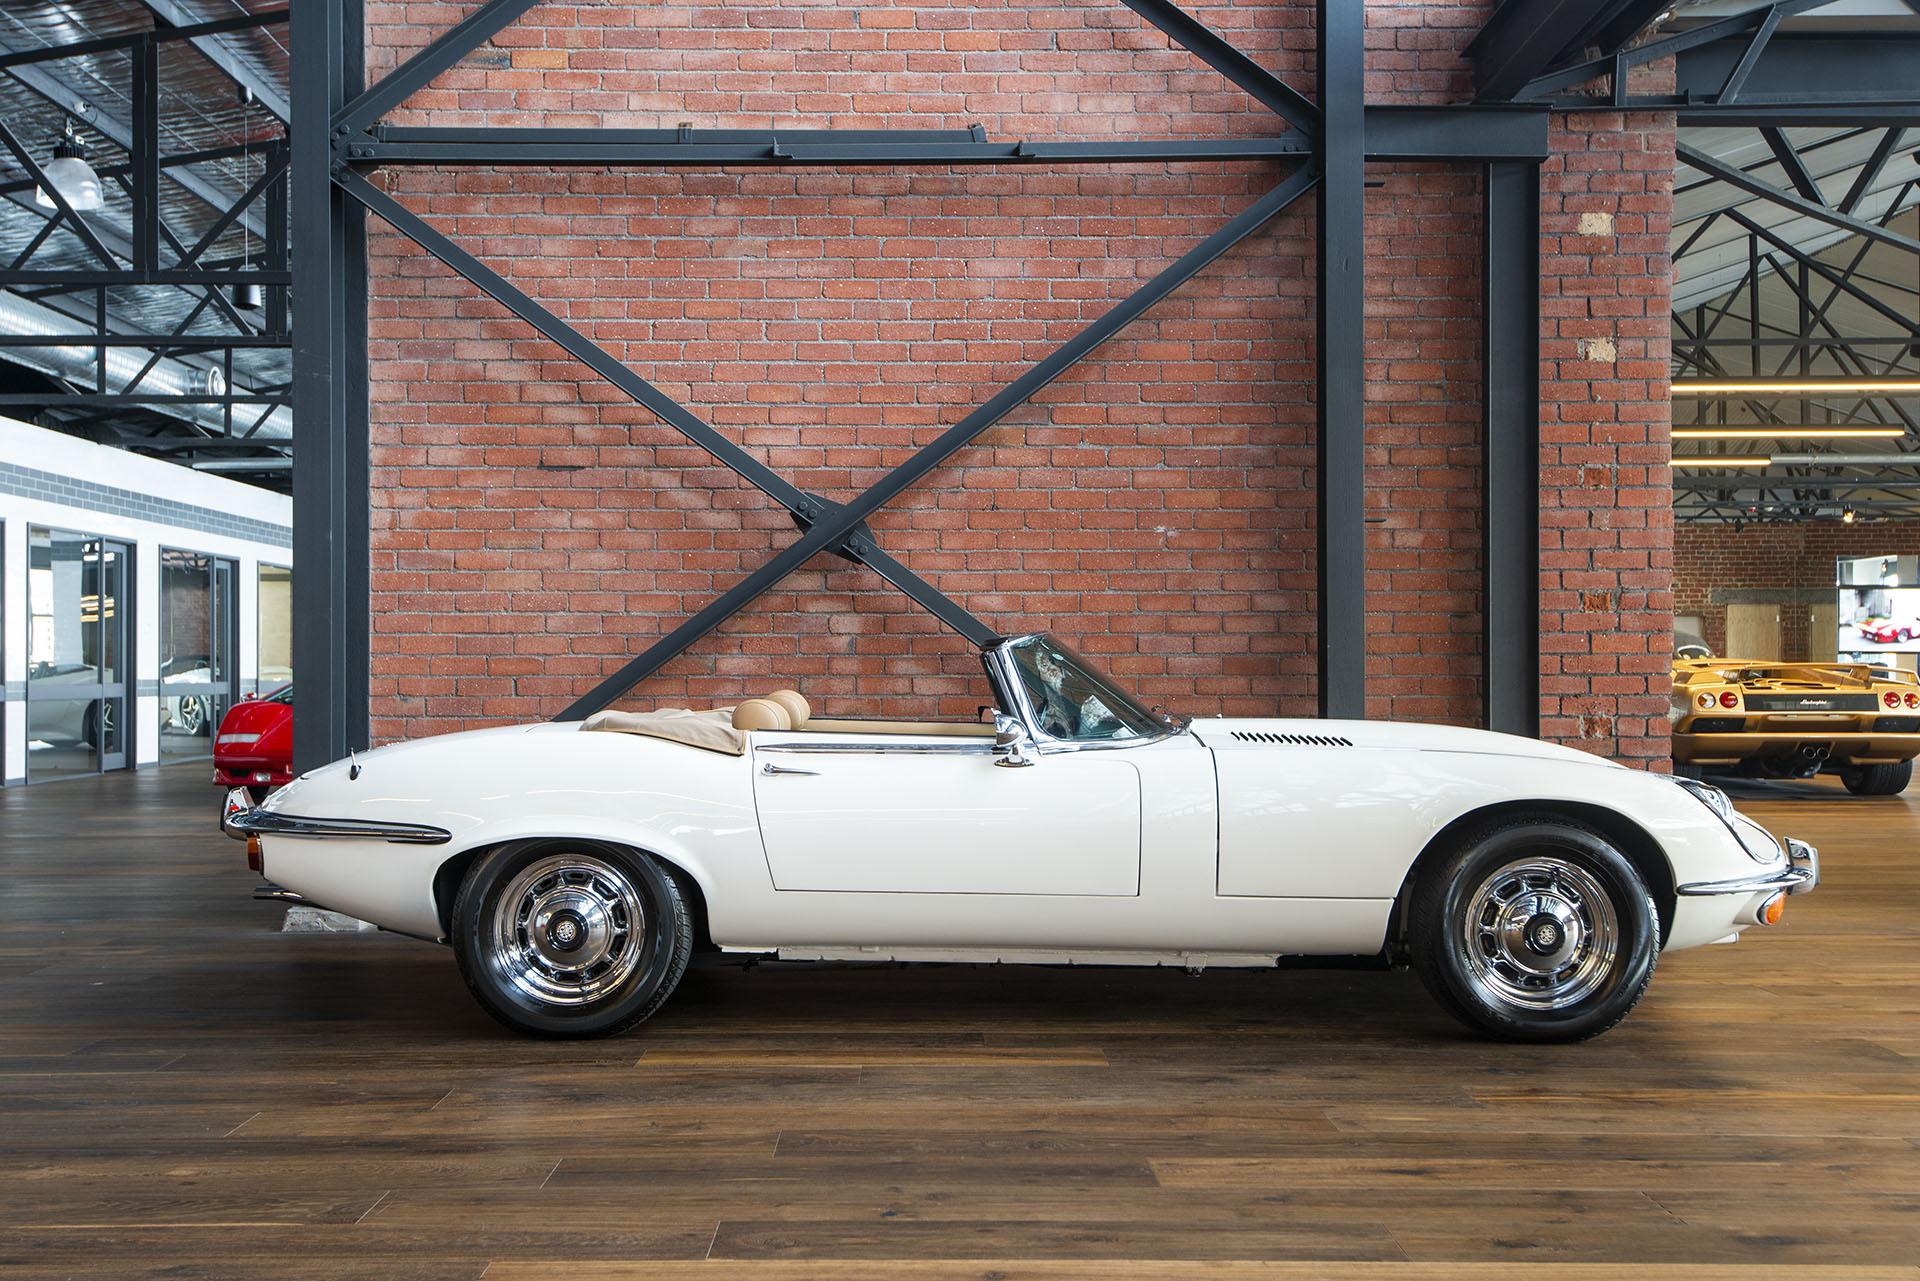 Jaguar E Type For Sale >> 1974 Jaguar E Type Series 3 V12 - Richmonds - Classic and Prestige Cars - Storage and Sales ...